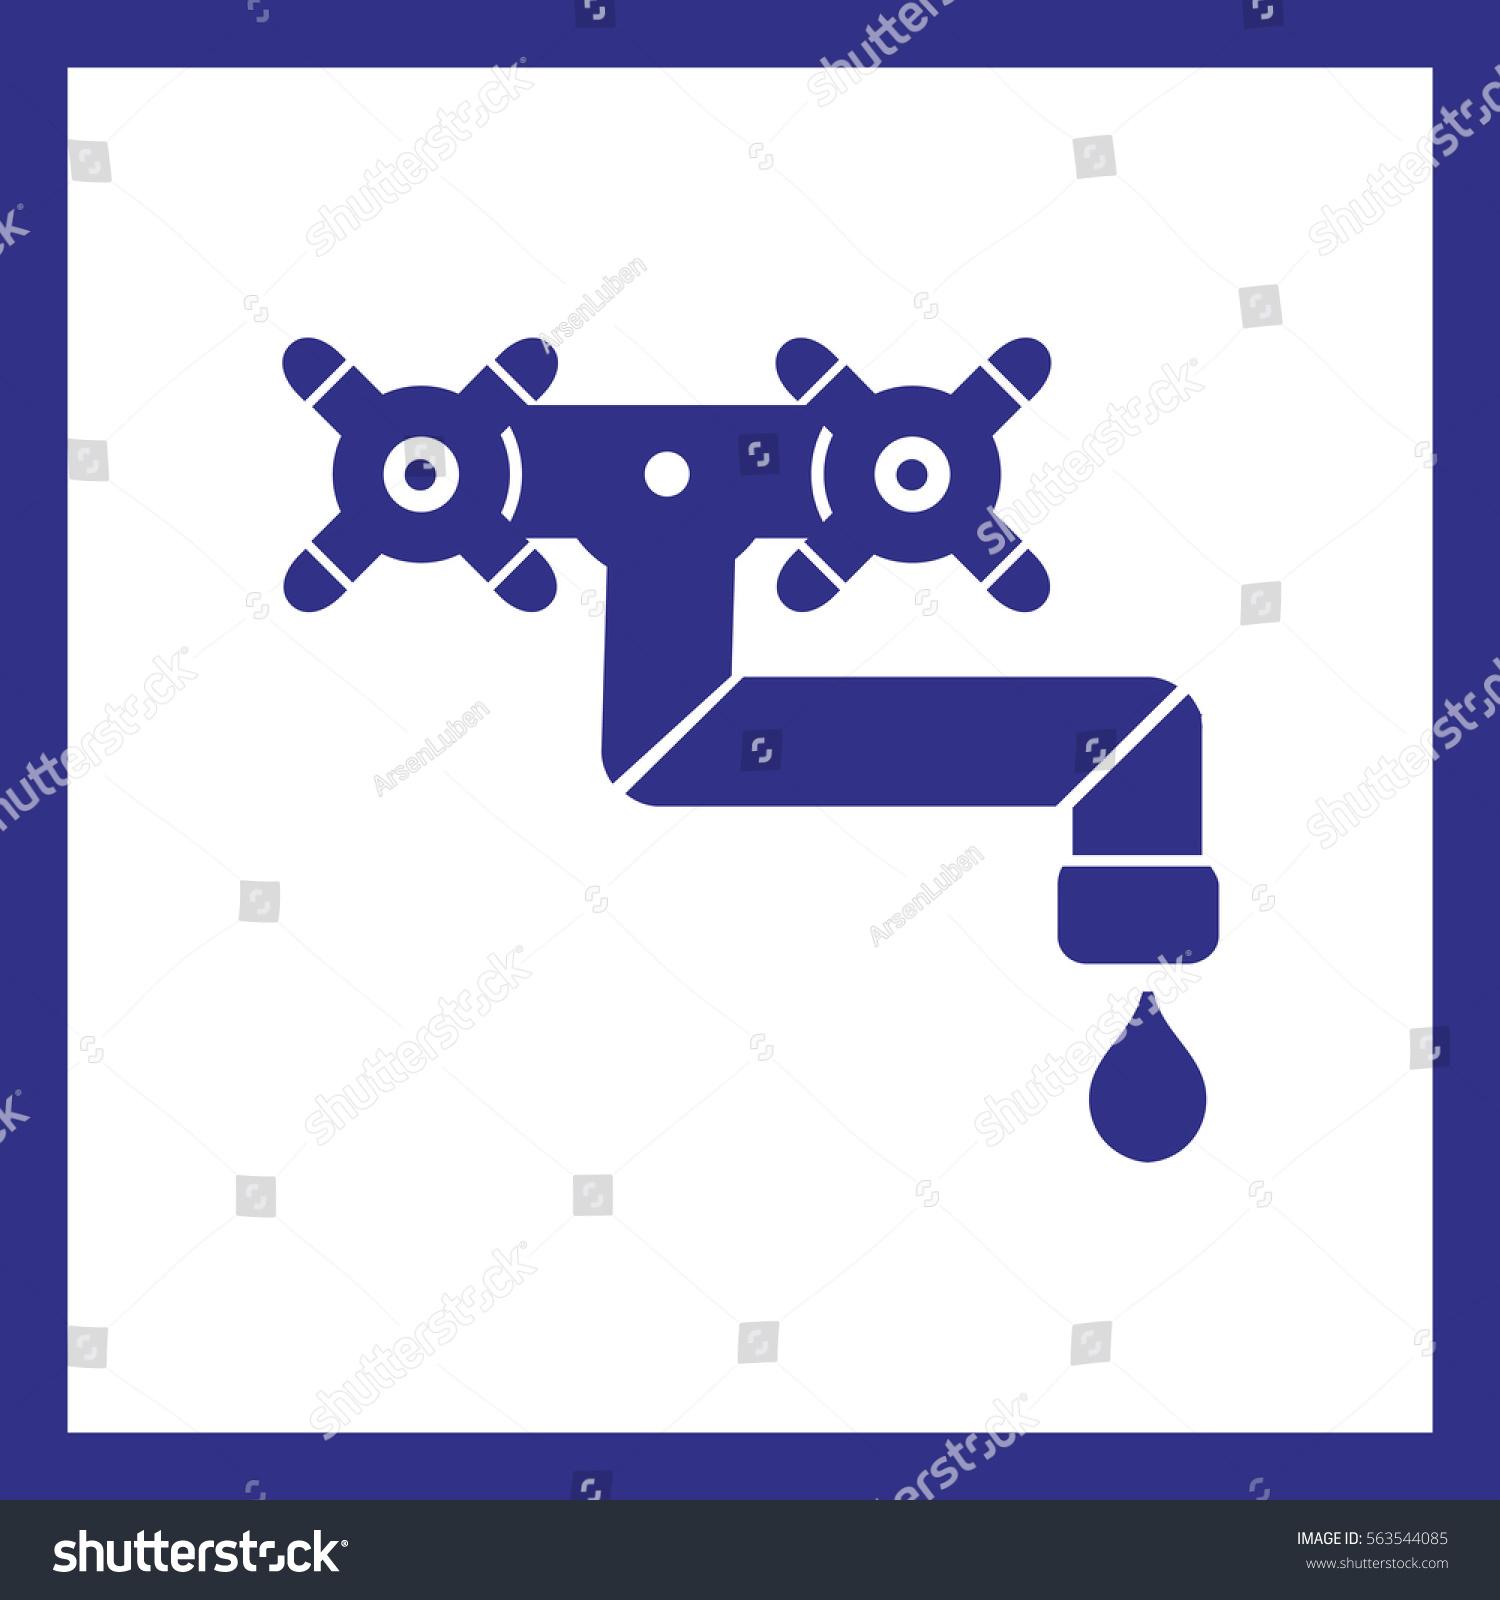 Water Faucet Vector Icon Stock Vector 563544085 - Shutterstock